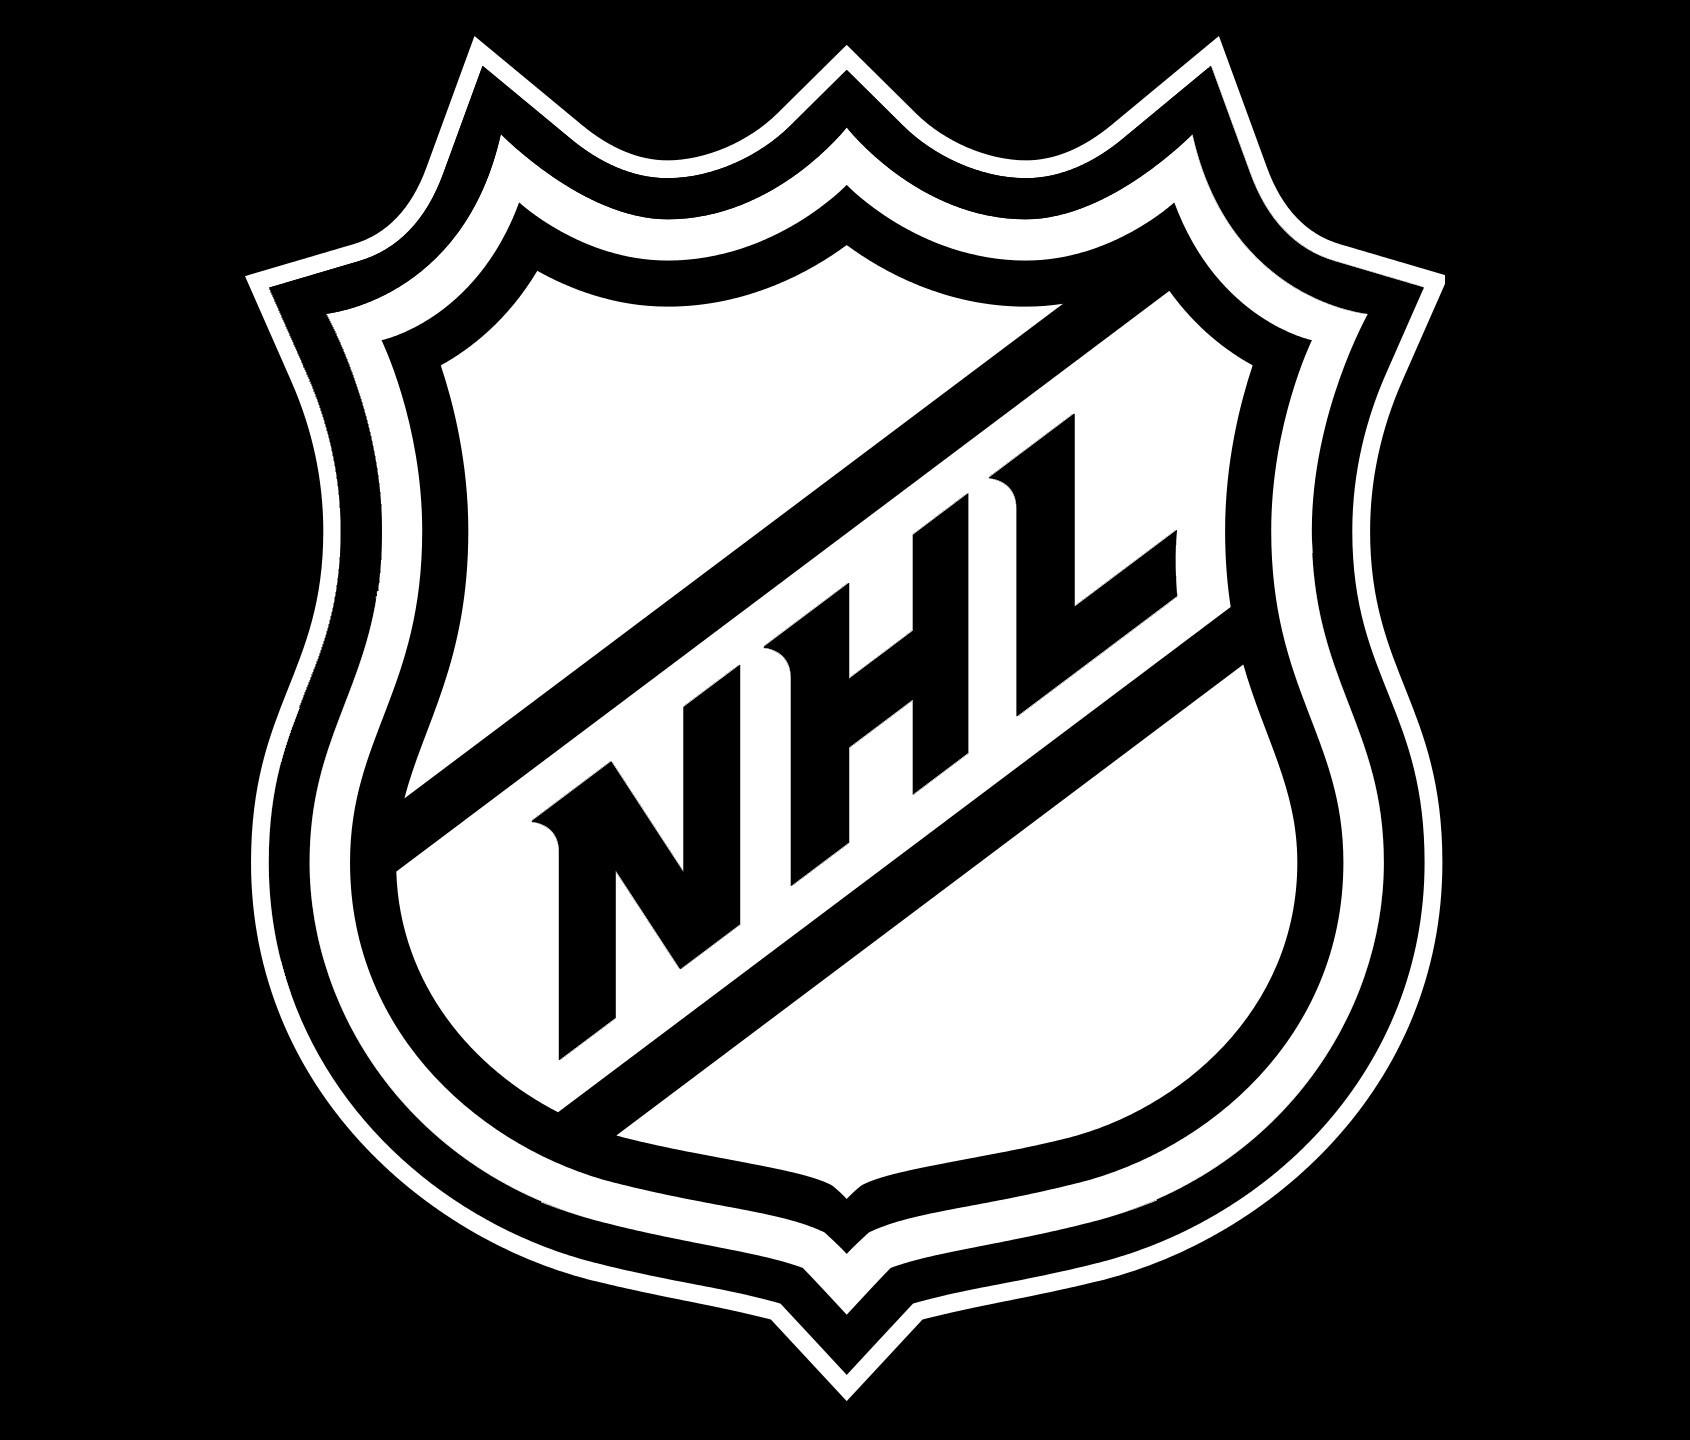 Бейсболки НХЛ (Кепки NHL)